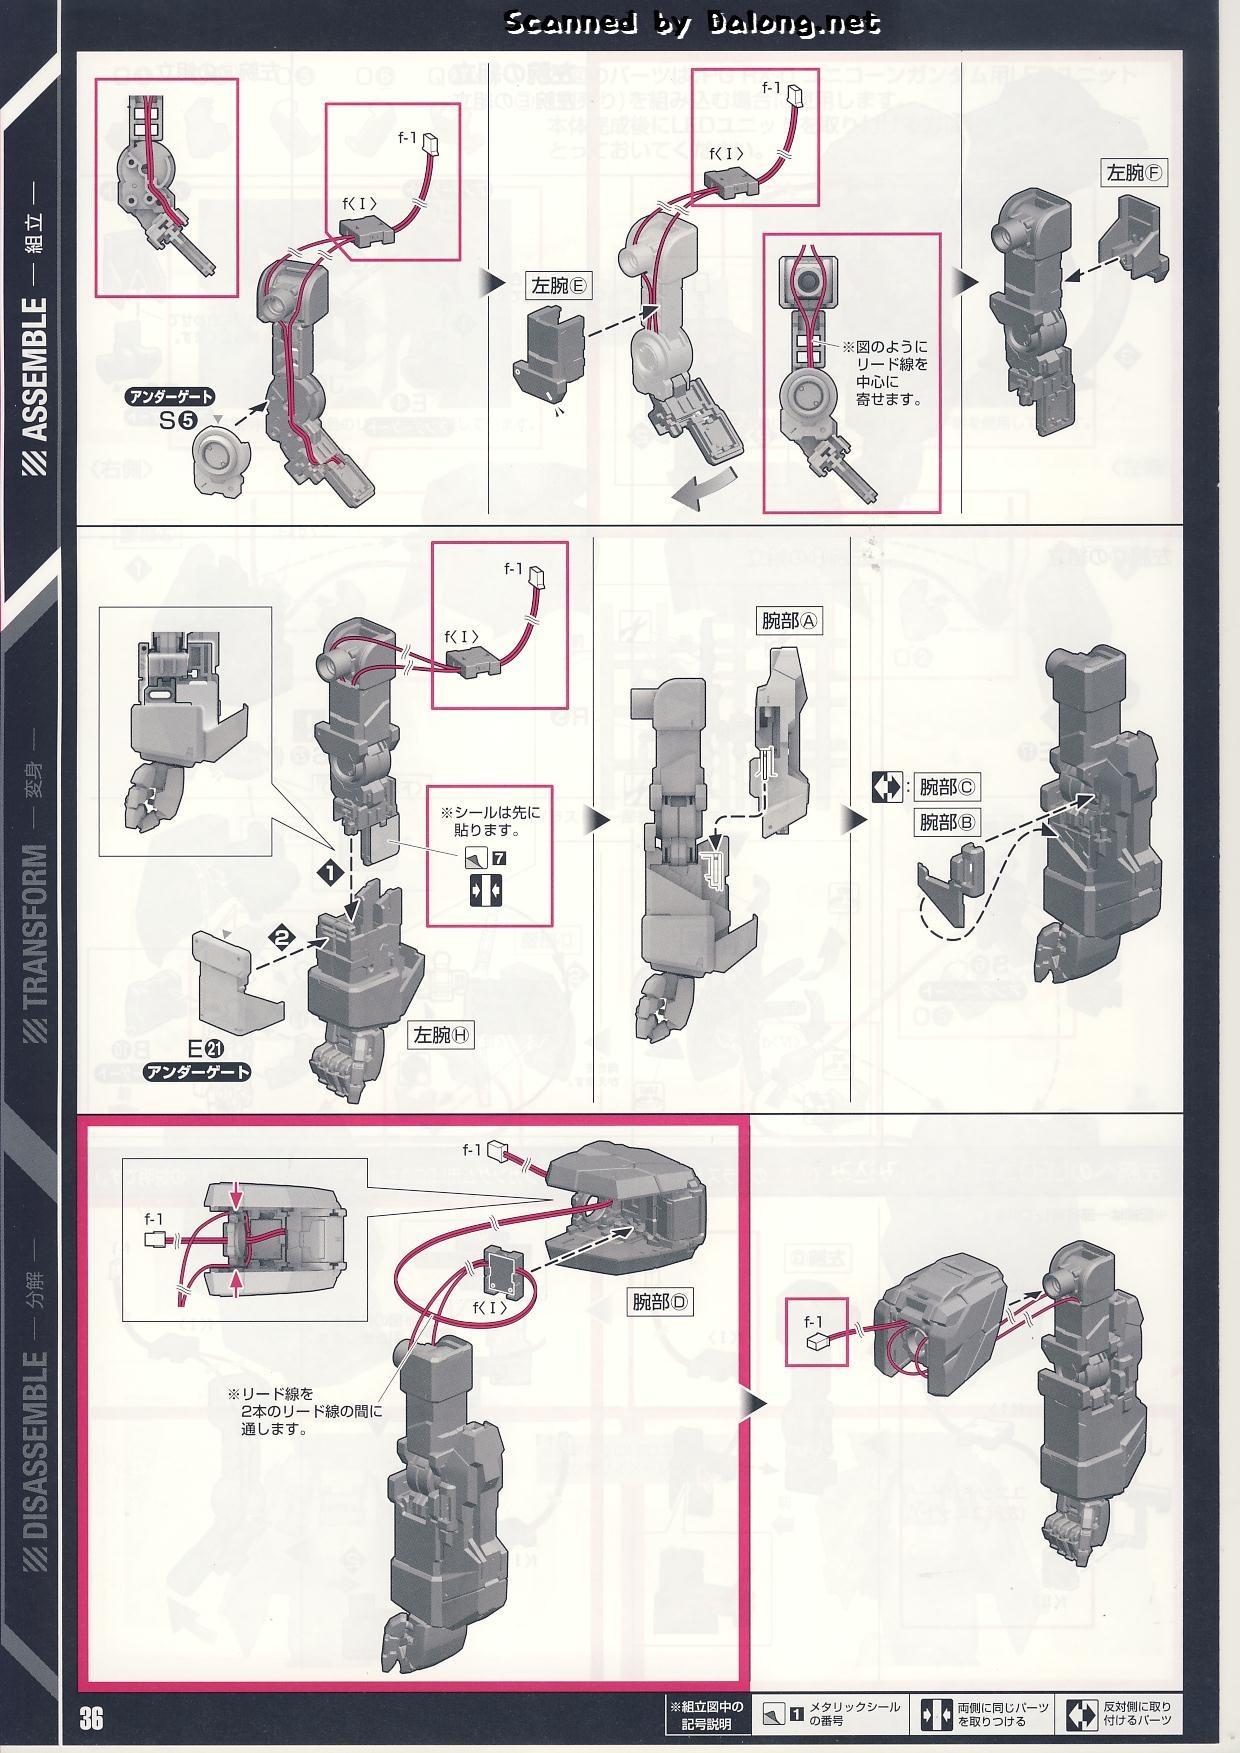 PG15独角兽高达说明36.JPG